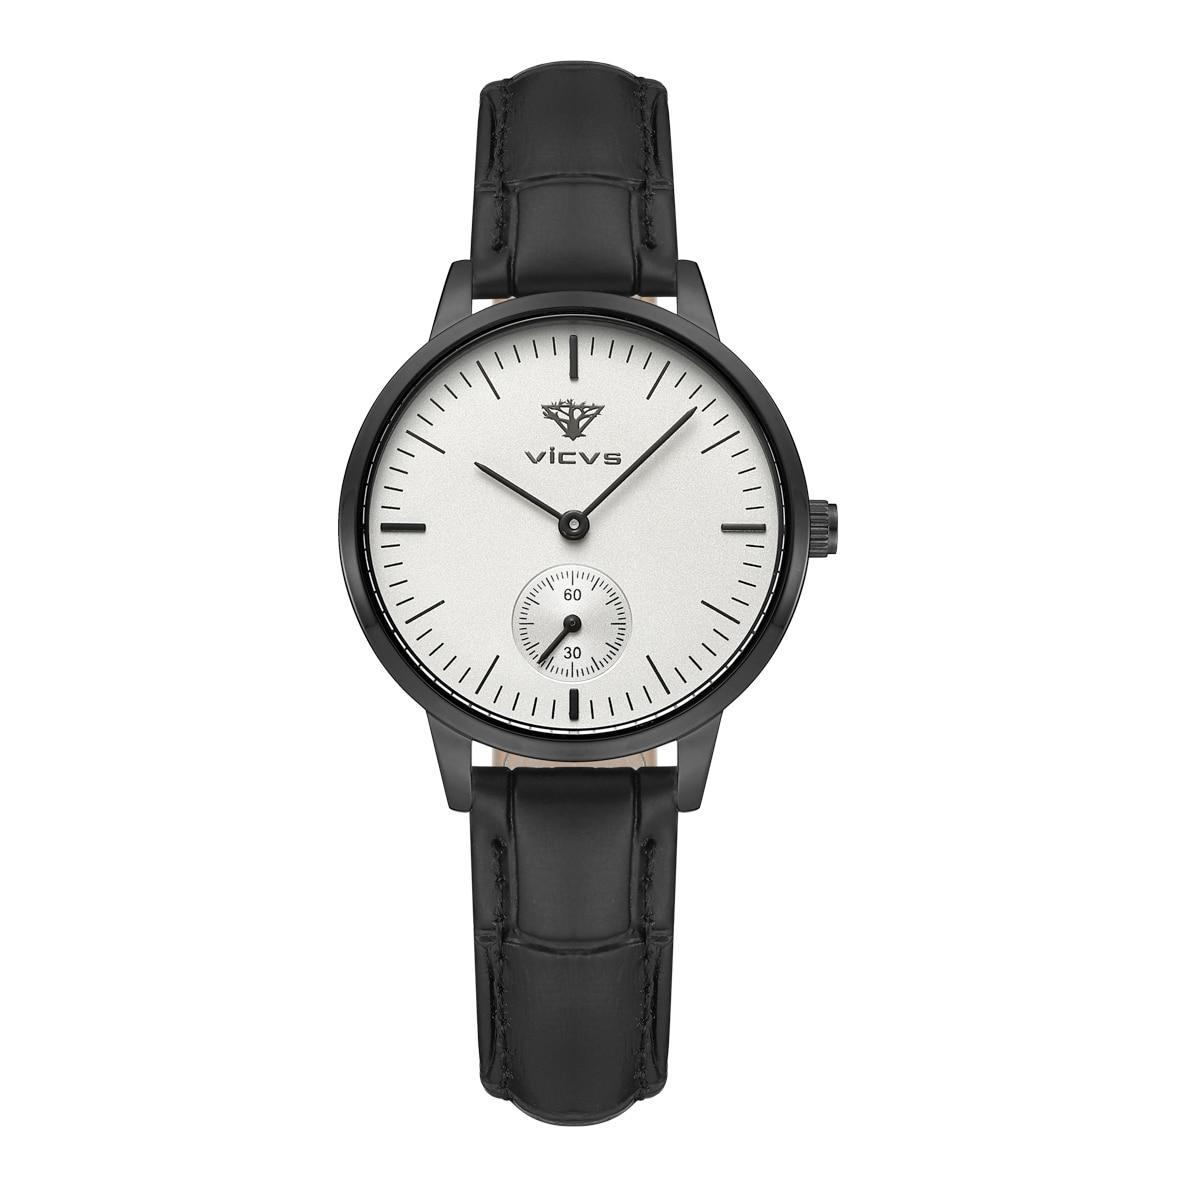 montre femme 2021 New Fashion Leather Strap Quartz Waterproof  Women Watches Luxury  Sport Wrist Watch Women's watches enlarge